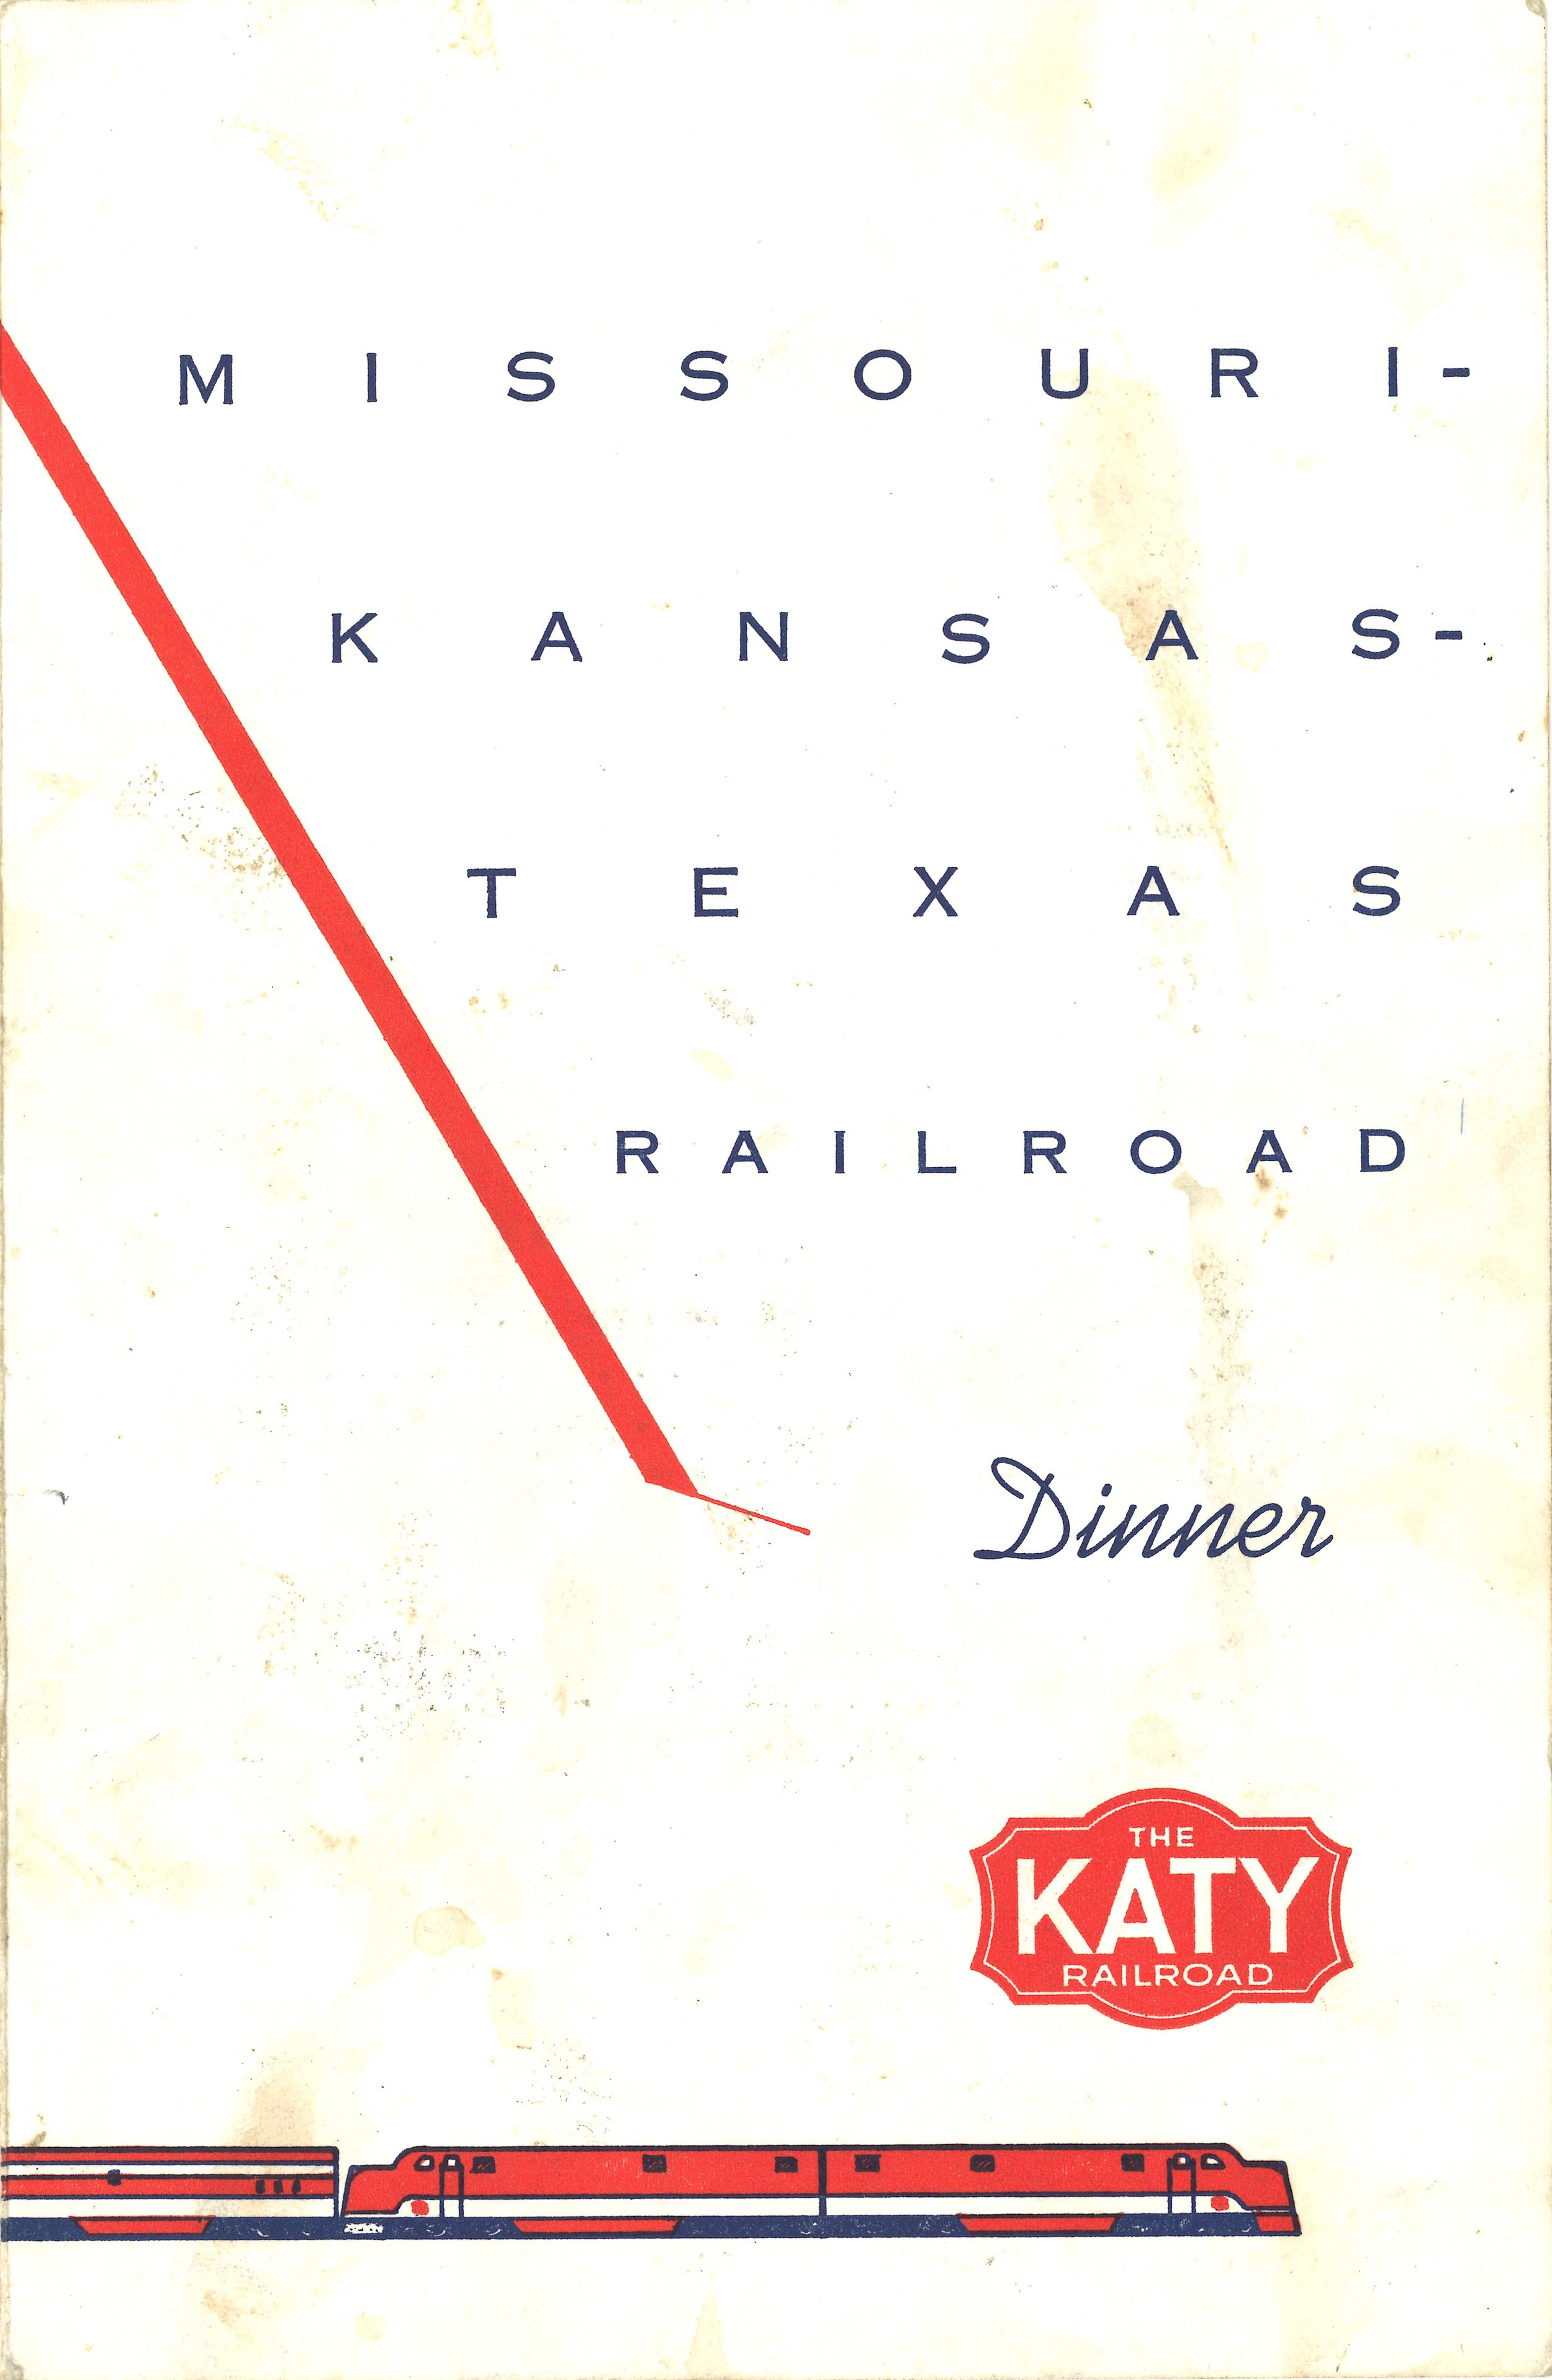 MKT Railroad Katy Railroad Dinner Menu 2_sm1.jpg